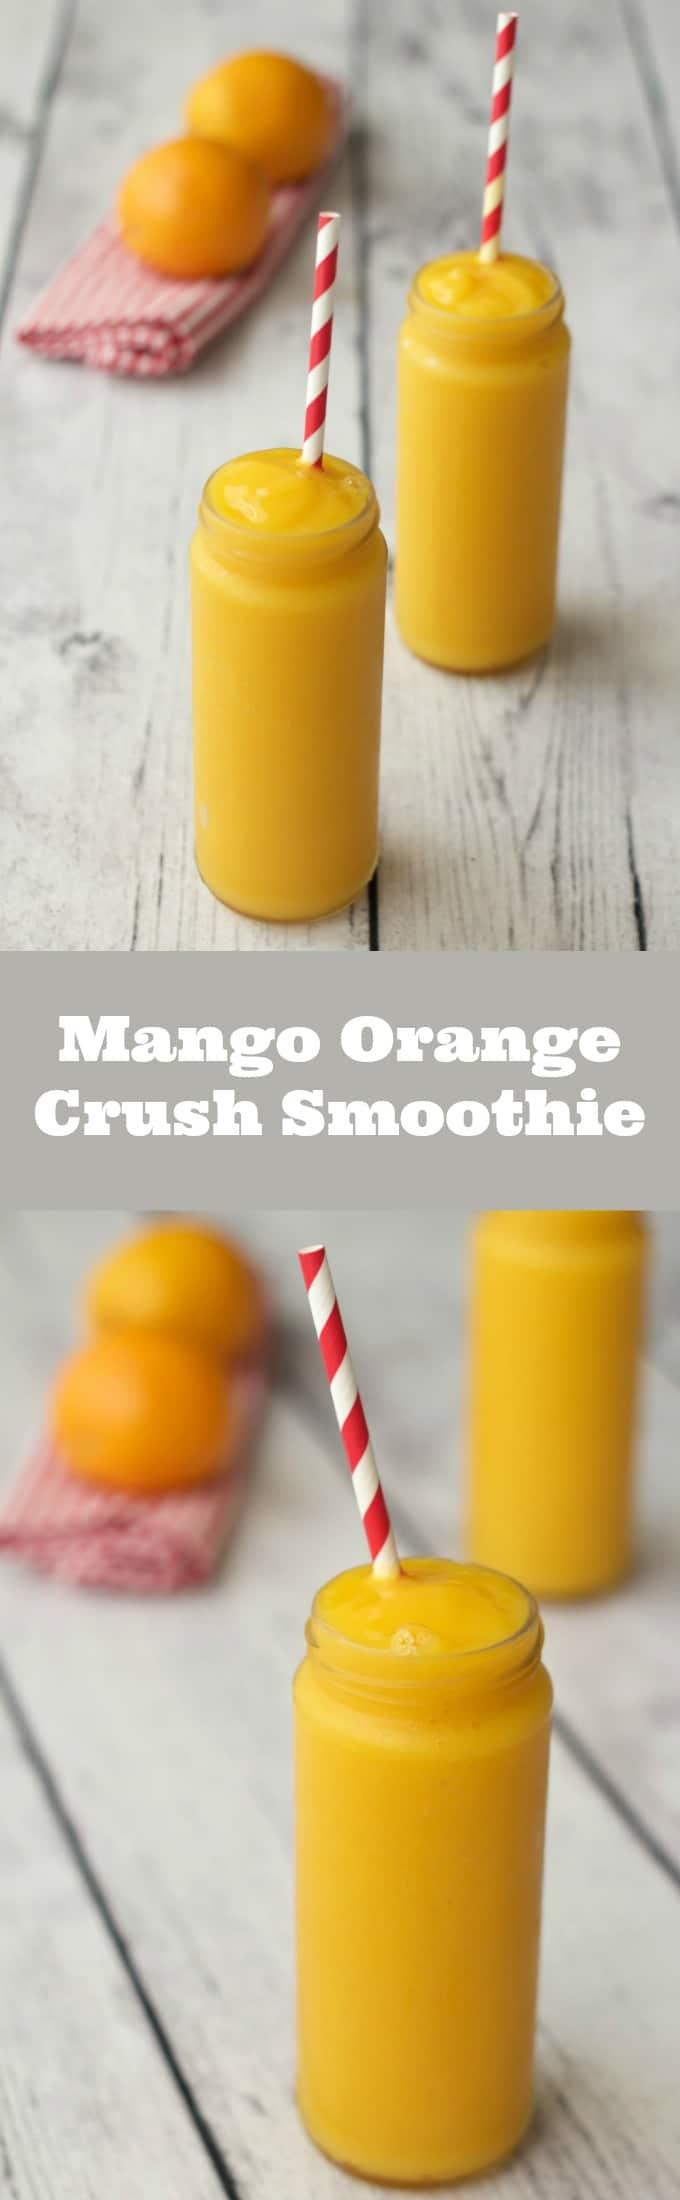 Mango Orange Crush Smoothie #vegan #lovingitvegan #dairyfree